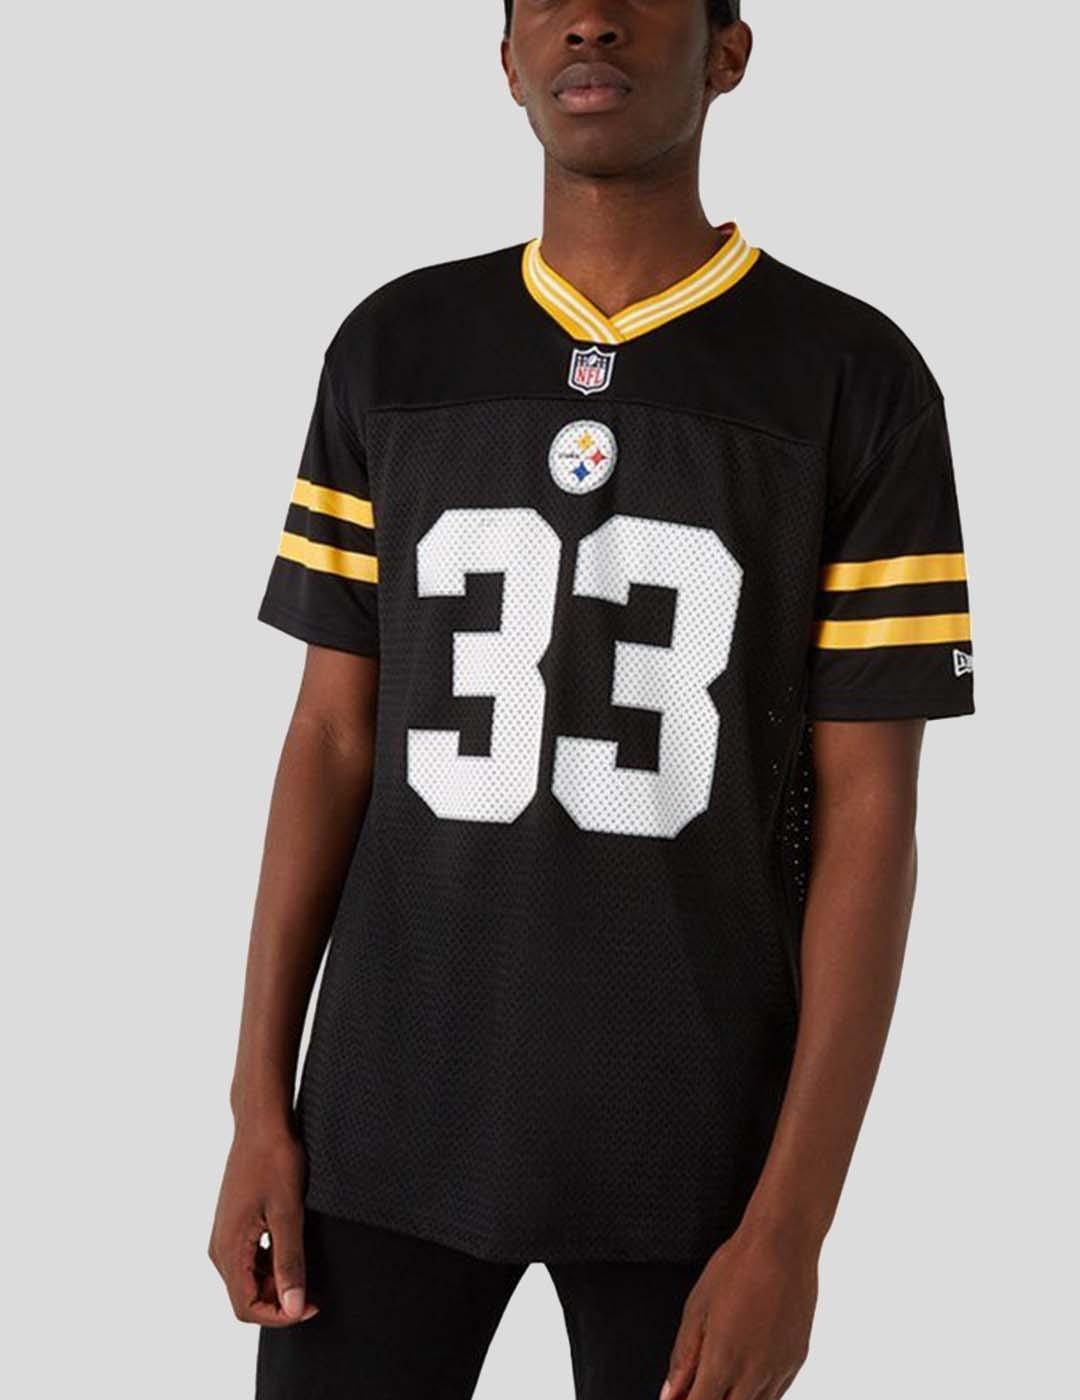 CAMISETA NEW ERA NFL LOGO OVERSIZED PITTSBURGH BLACK YELLOW